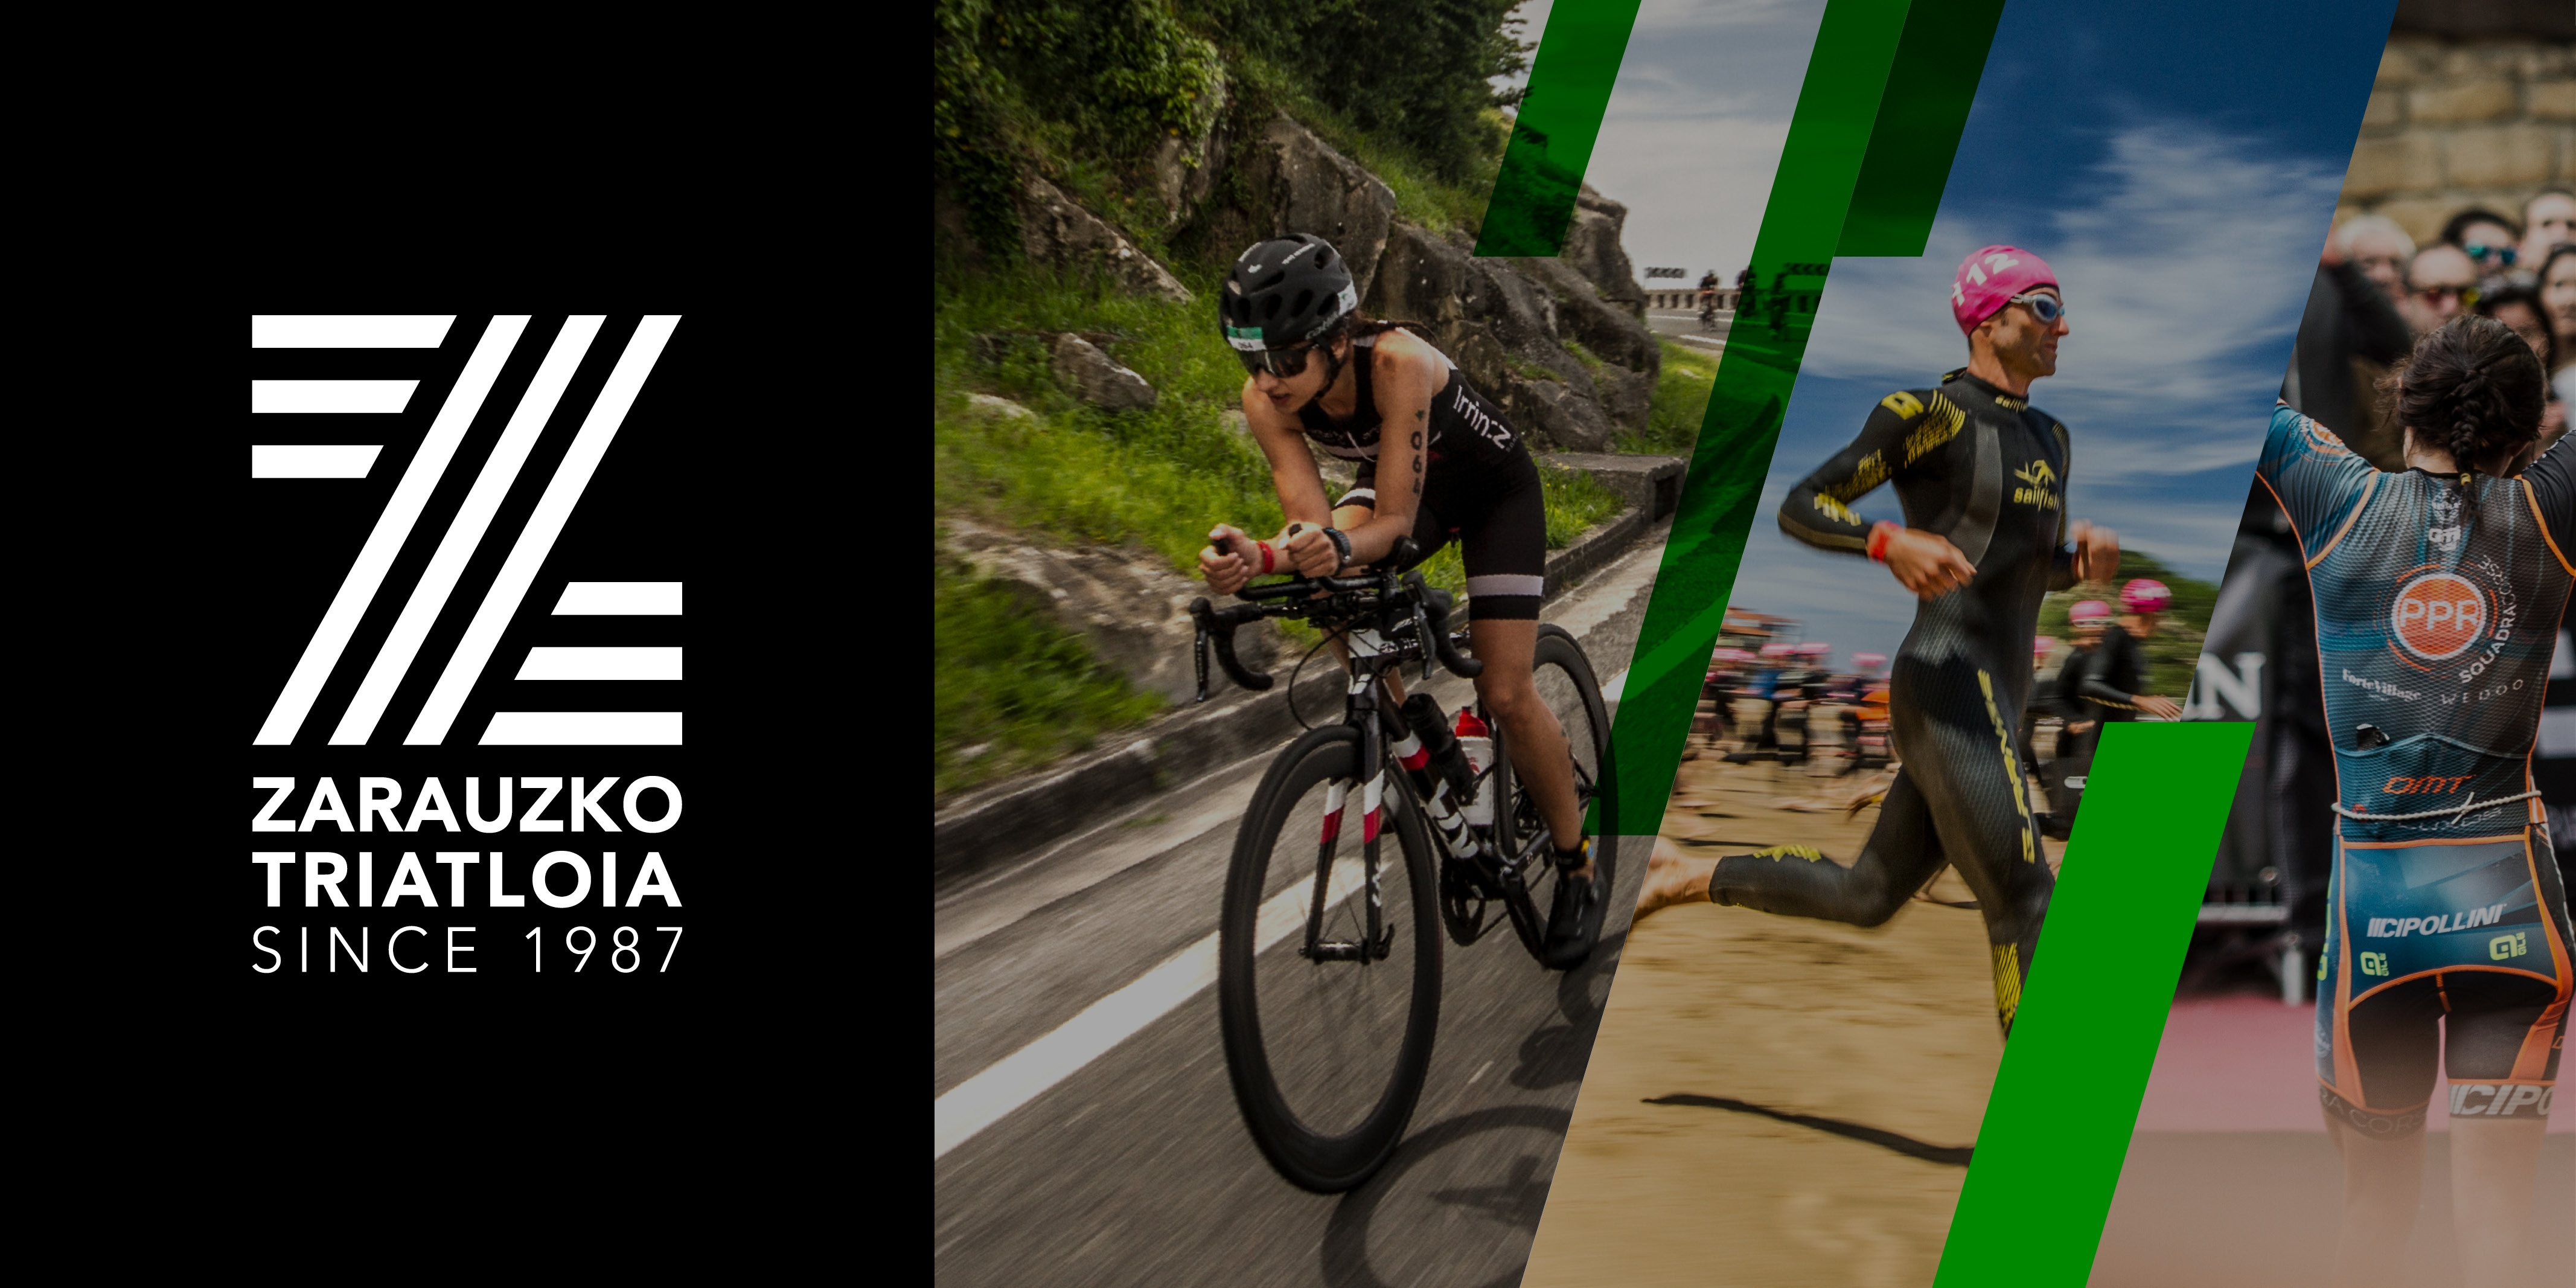 Zarauzko Triatloia 2020 (evento cancelado)